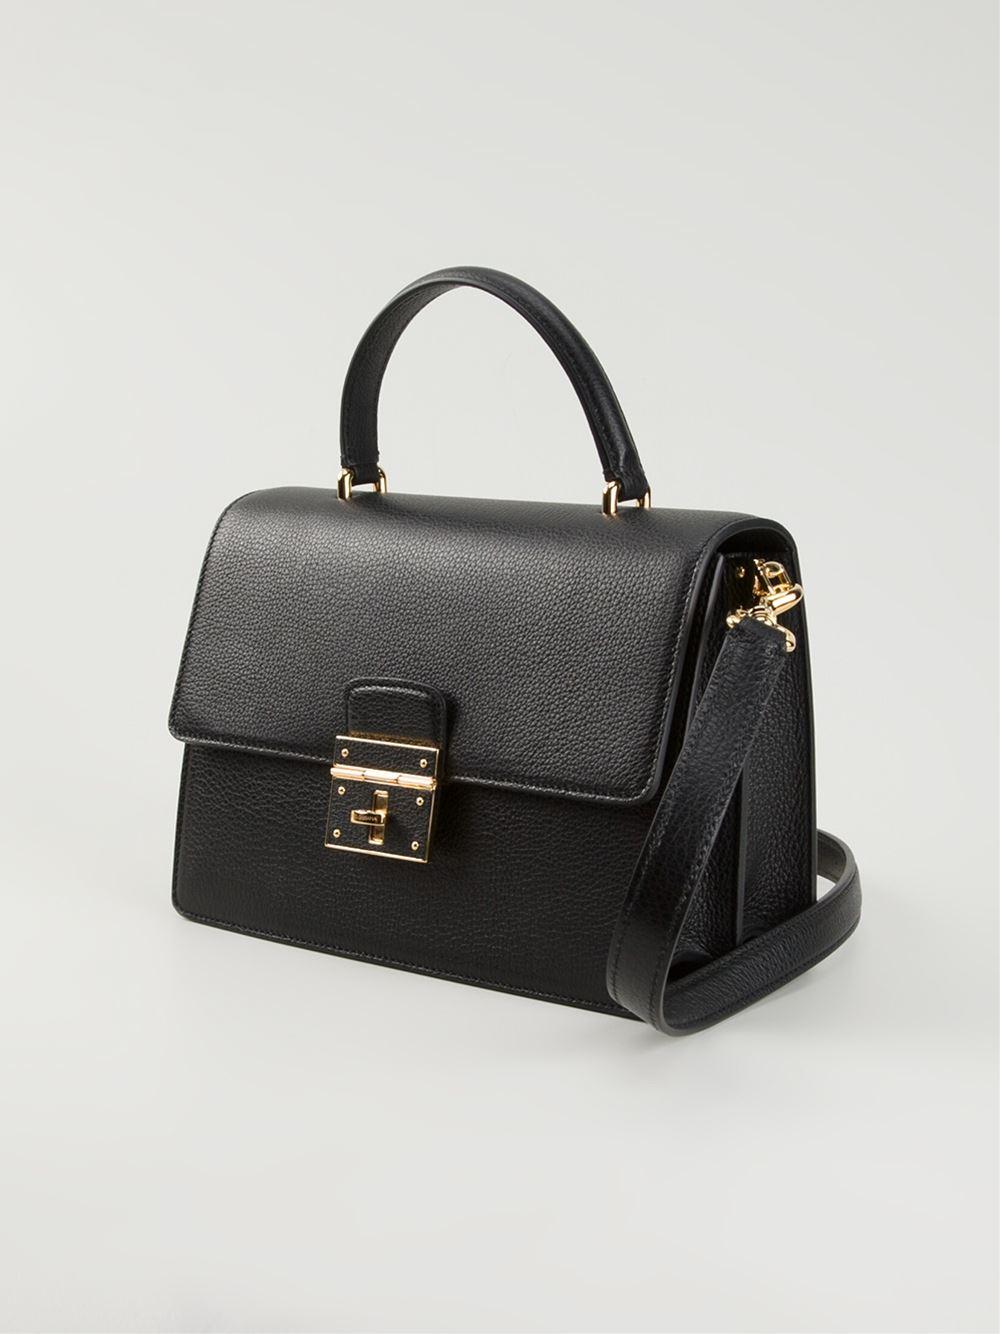 263d36890d31 Dolce And Gabbana Black Handbag